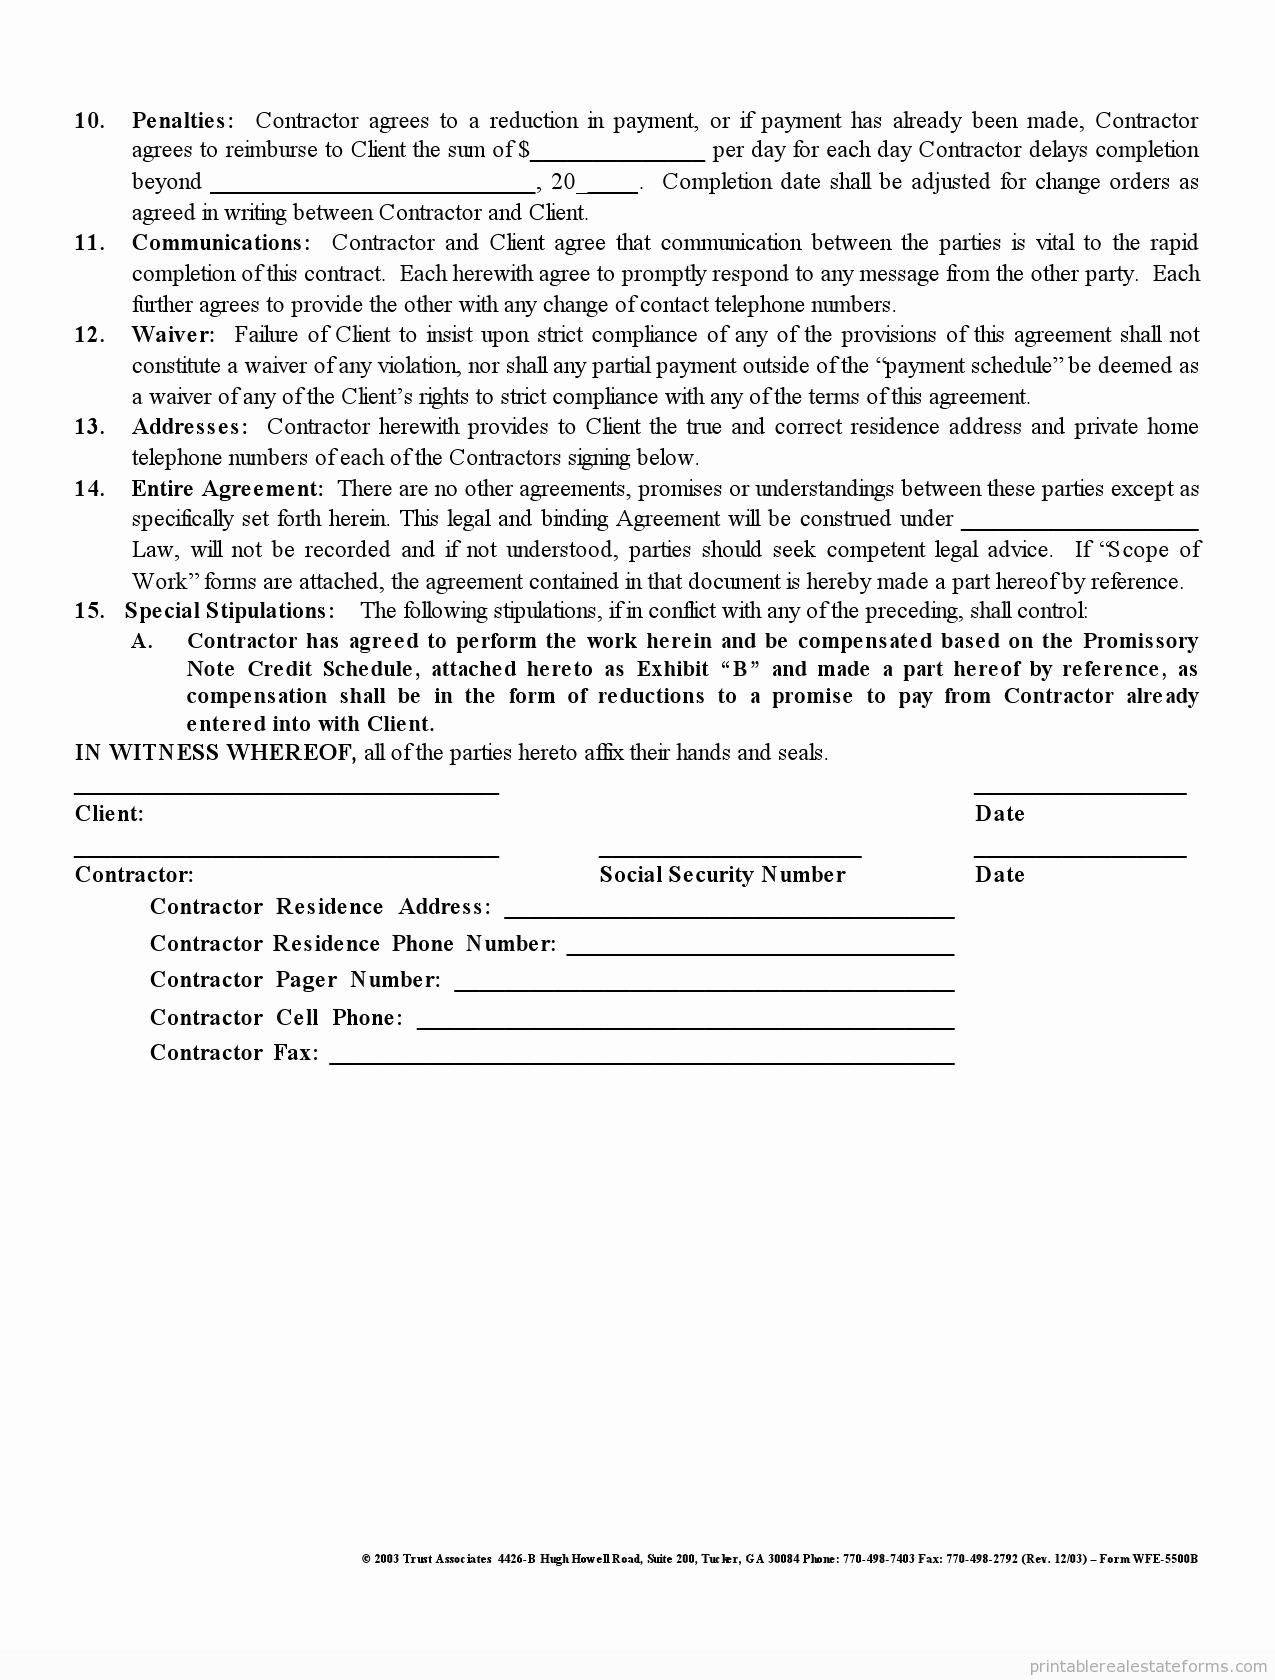 Free Printable Contractor forms Elegant Free Printable Independent Contractor Agreement form